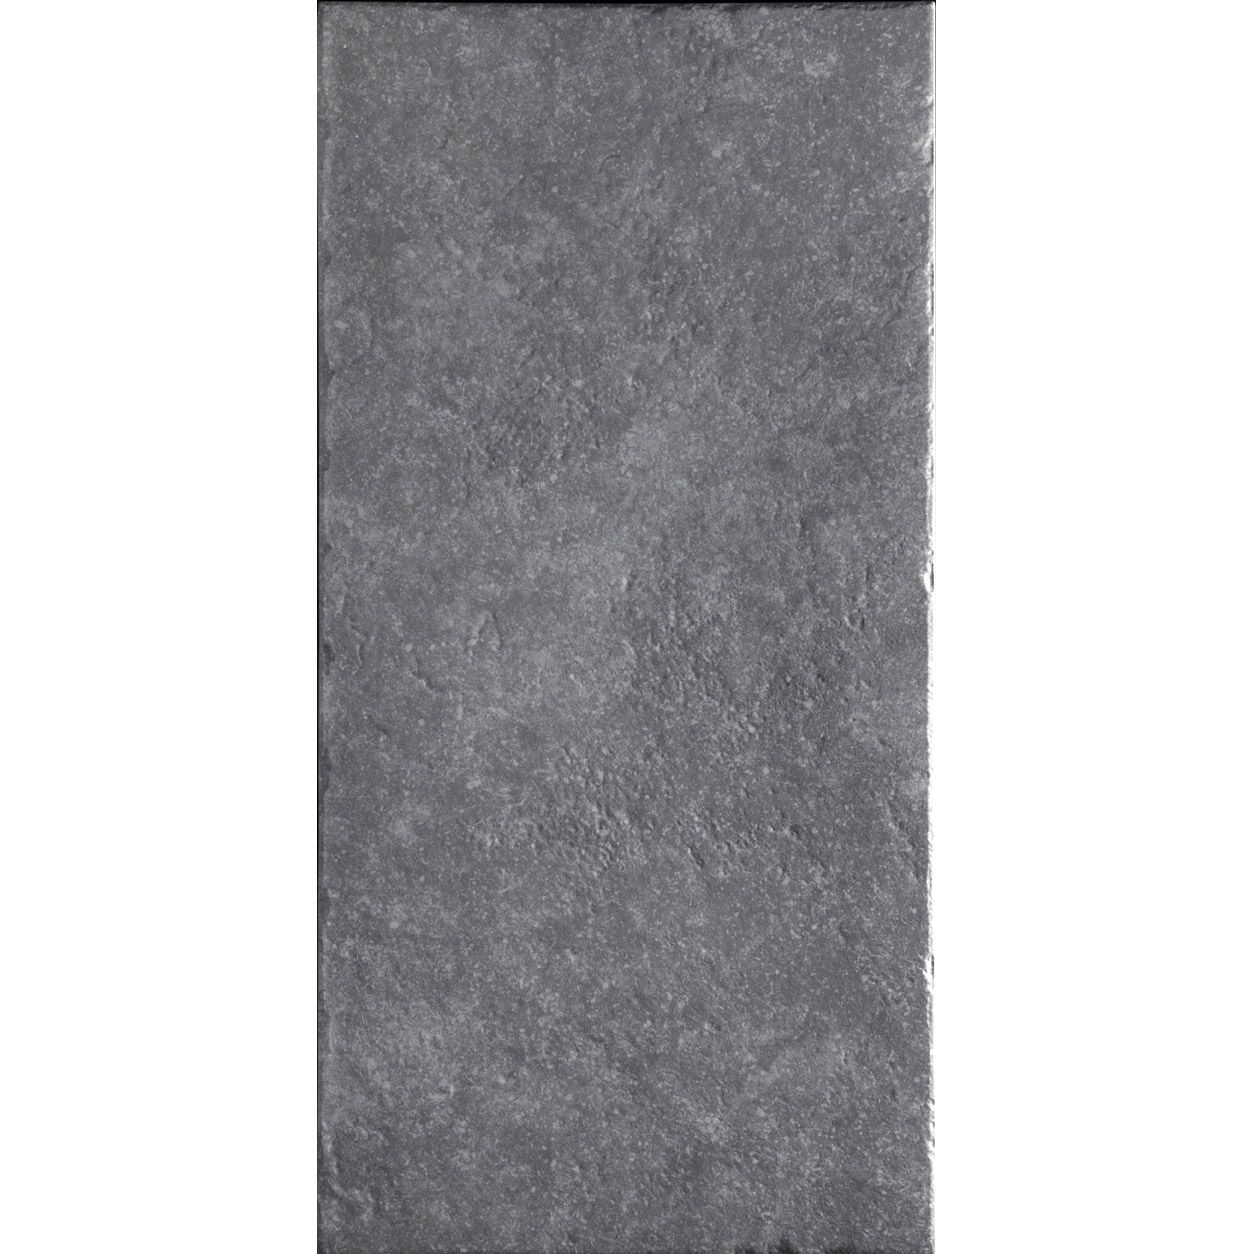 carrelage int rieur loggia en gr s c rame teint masse griggio 30 x 60 cm leroy merlin. Black Bedroom Furniture Sets. Home Design Ideas